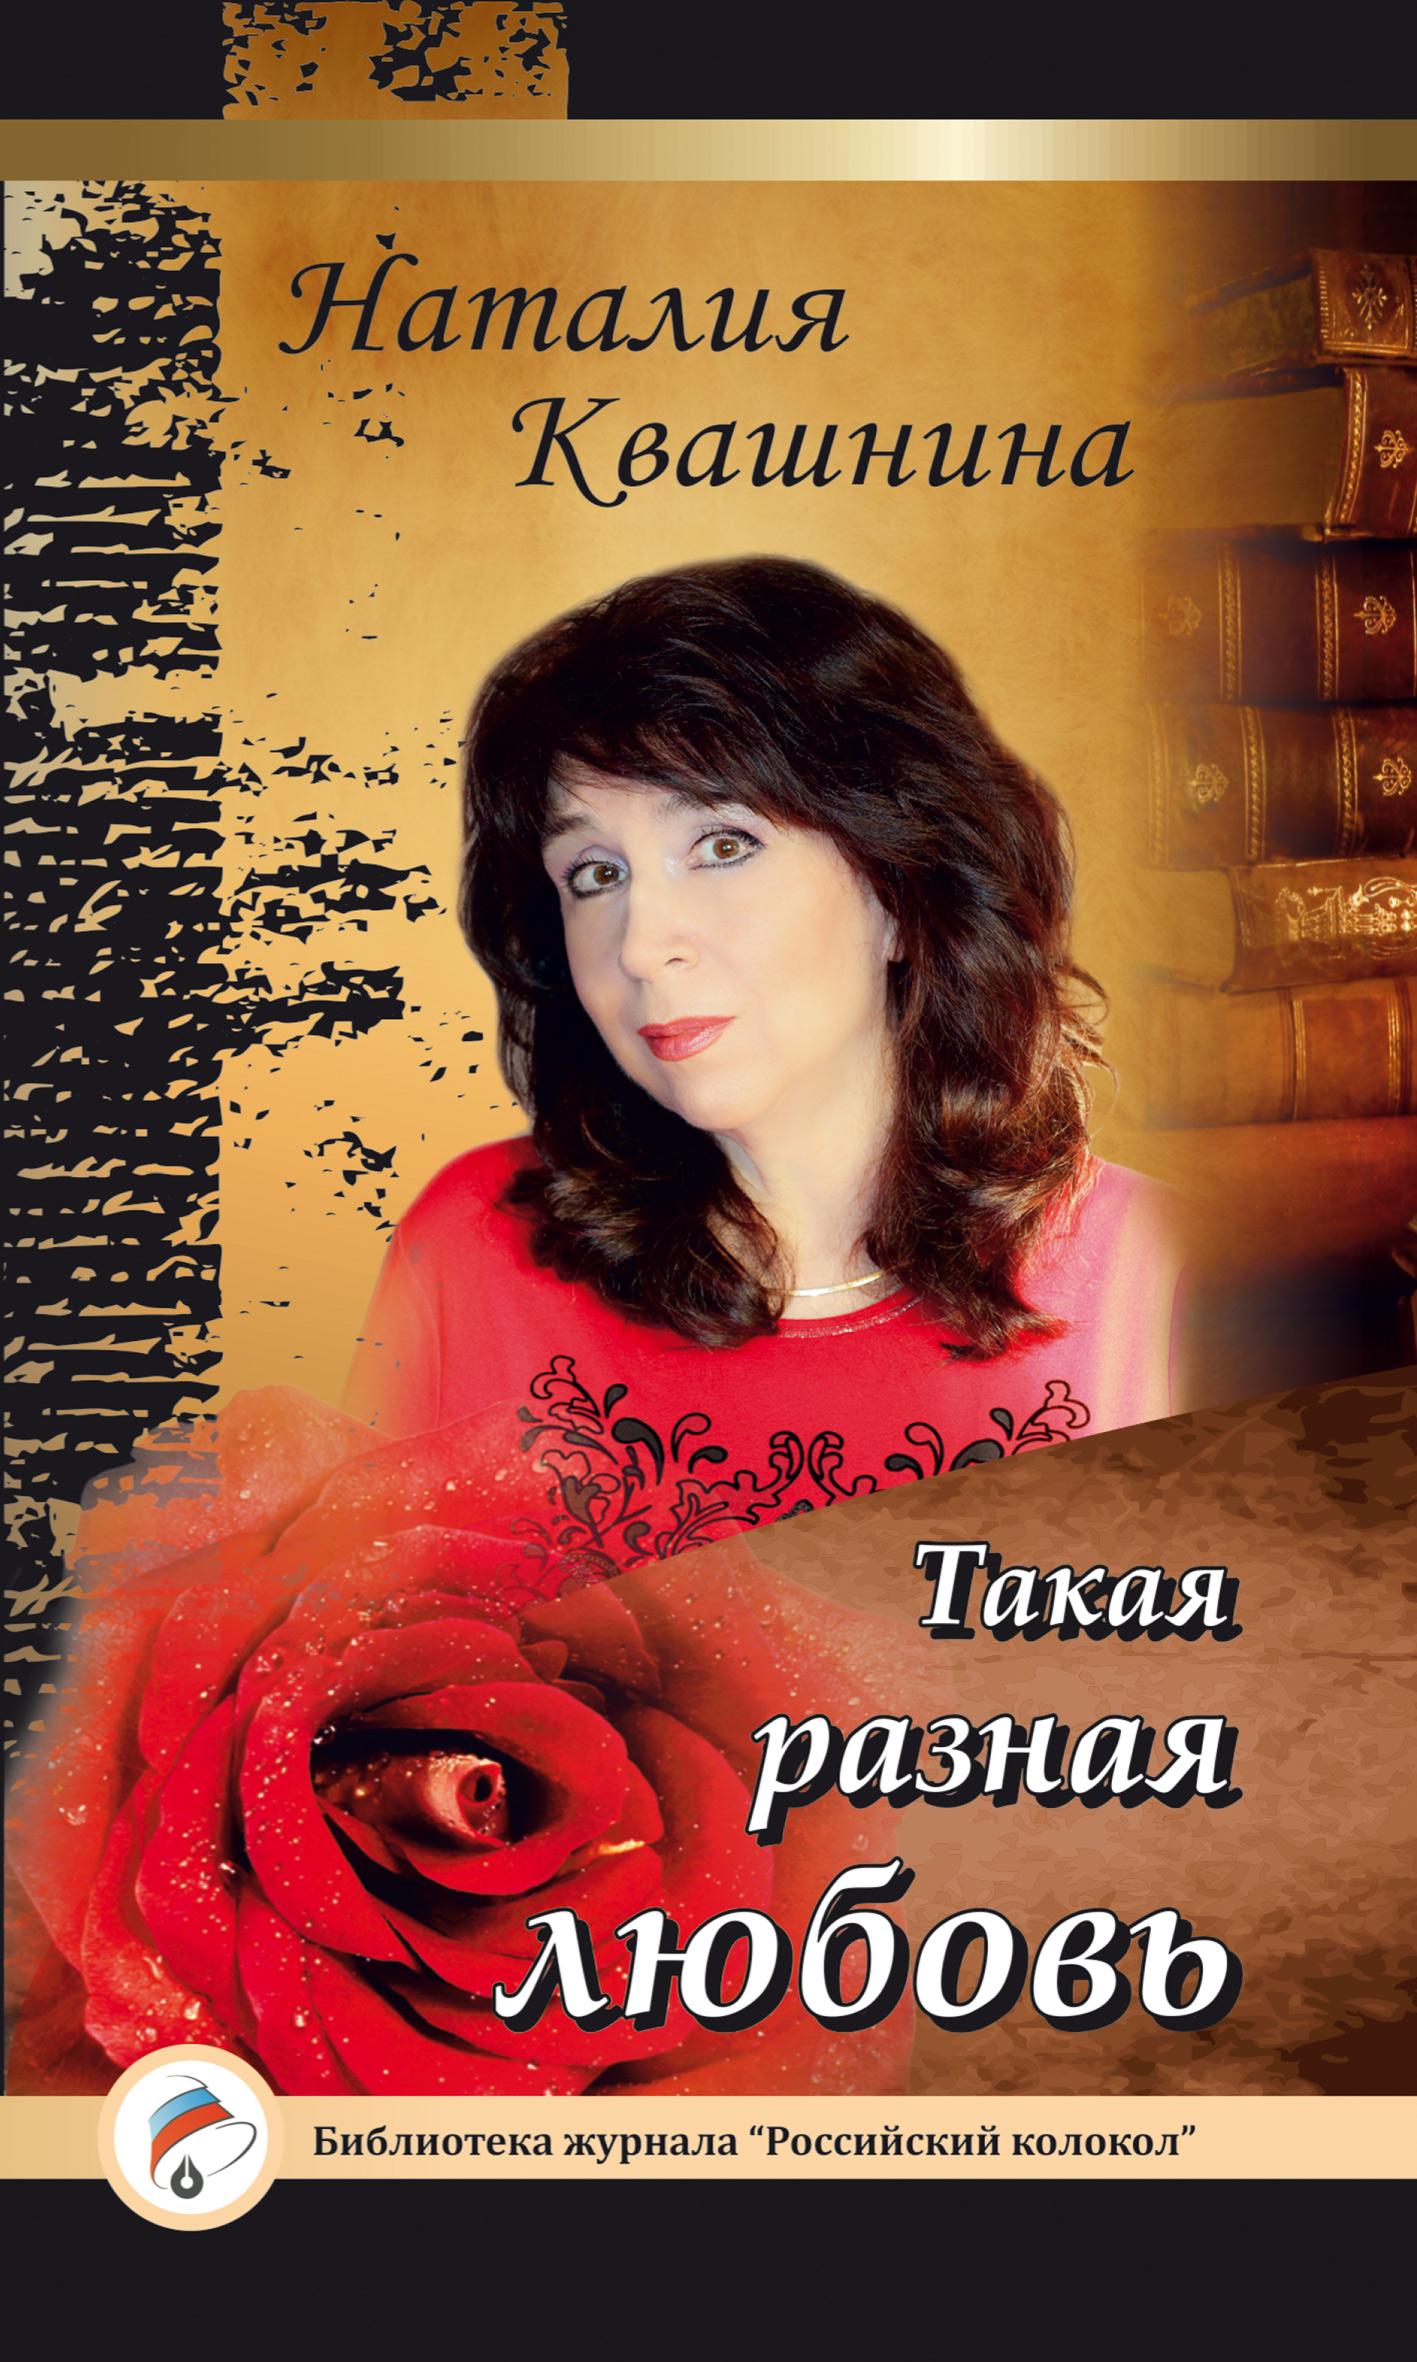 Наталия Квашнина Такая разная любовь наталия квашнина откровение isbn 978 5 906784 53 7